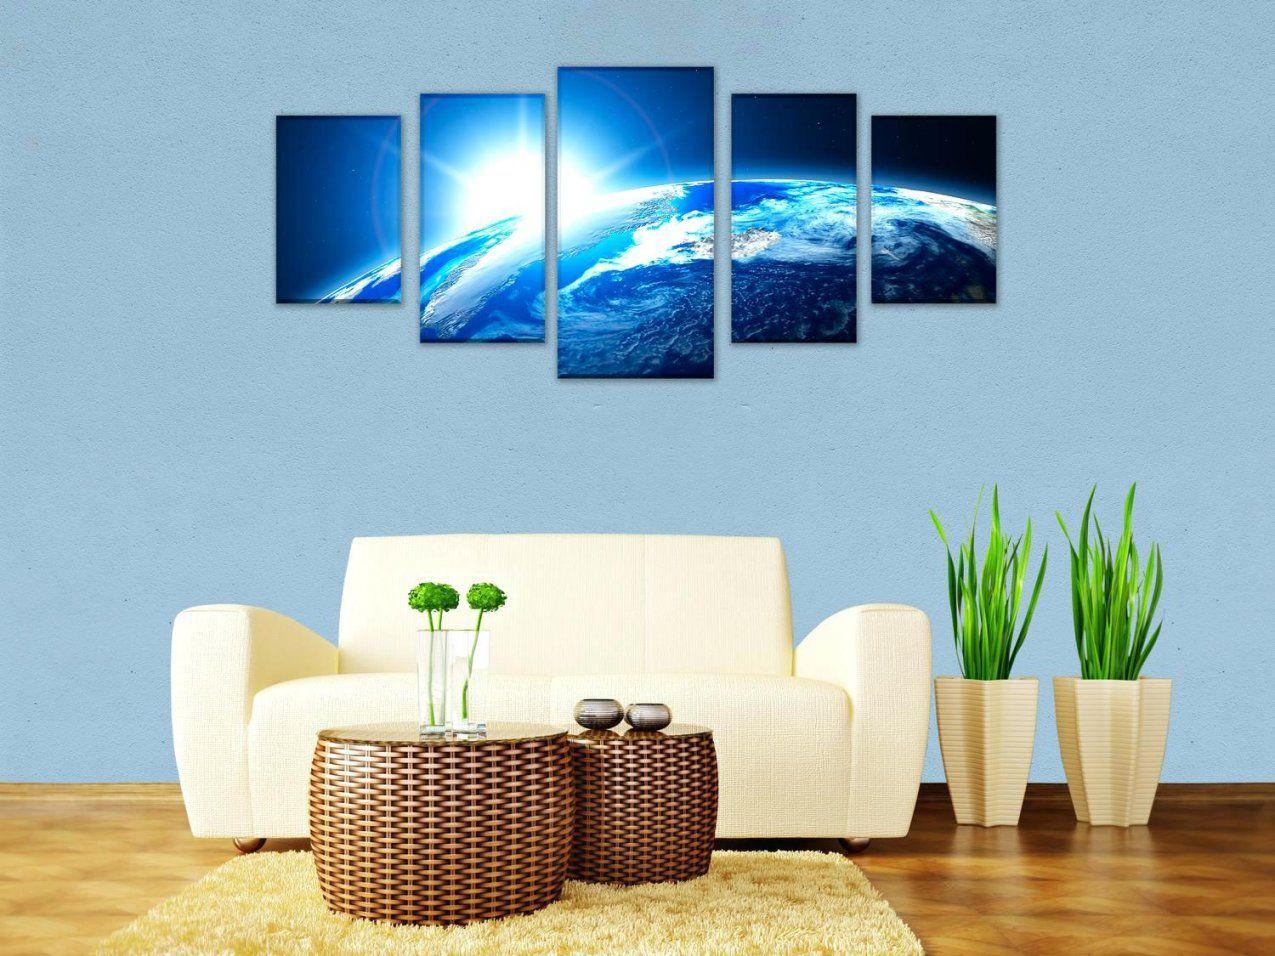 mehrteilige leinwandbilder wandbilder mehrteilig selbst gestalten von leinwand mehrteilig selbst. Black Bedroom Furniture Sets. Home Design Ideas